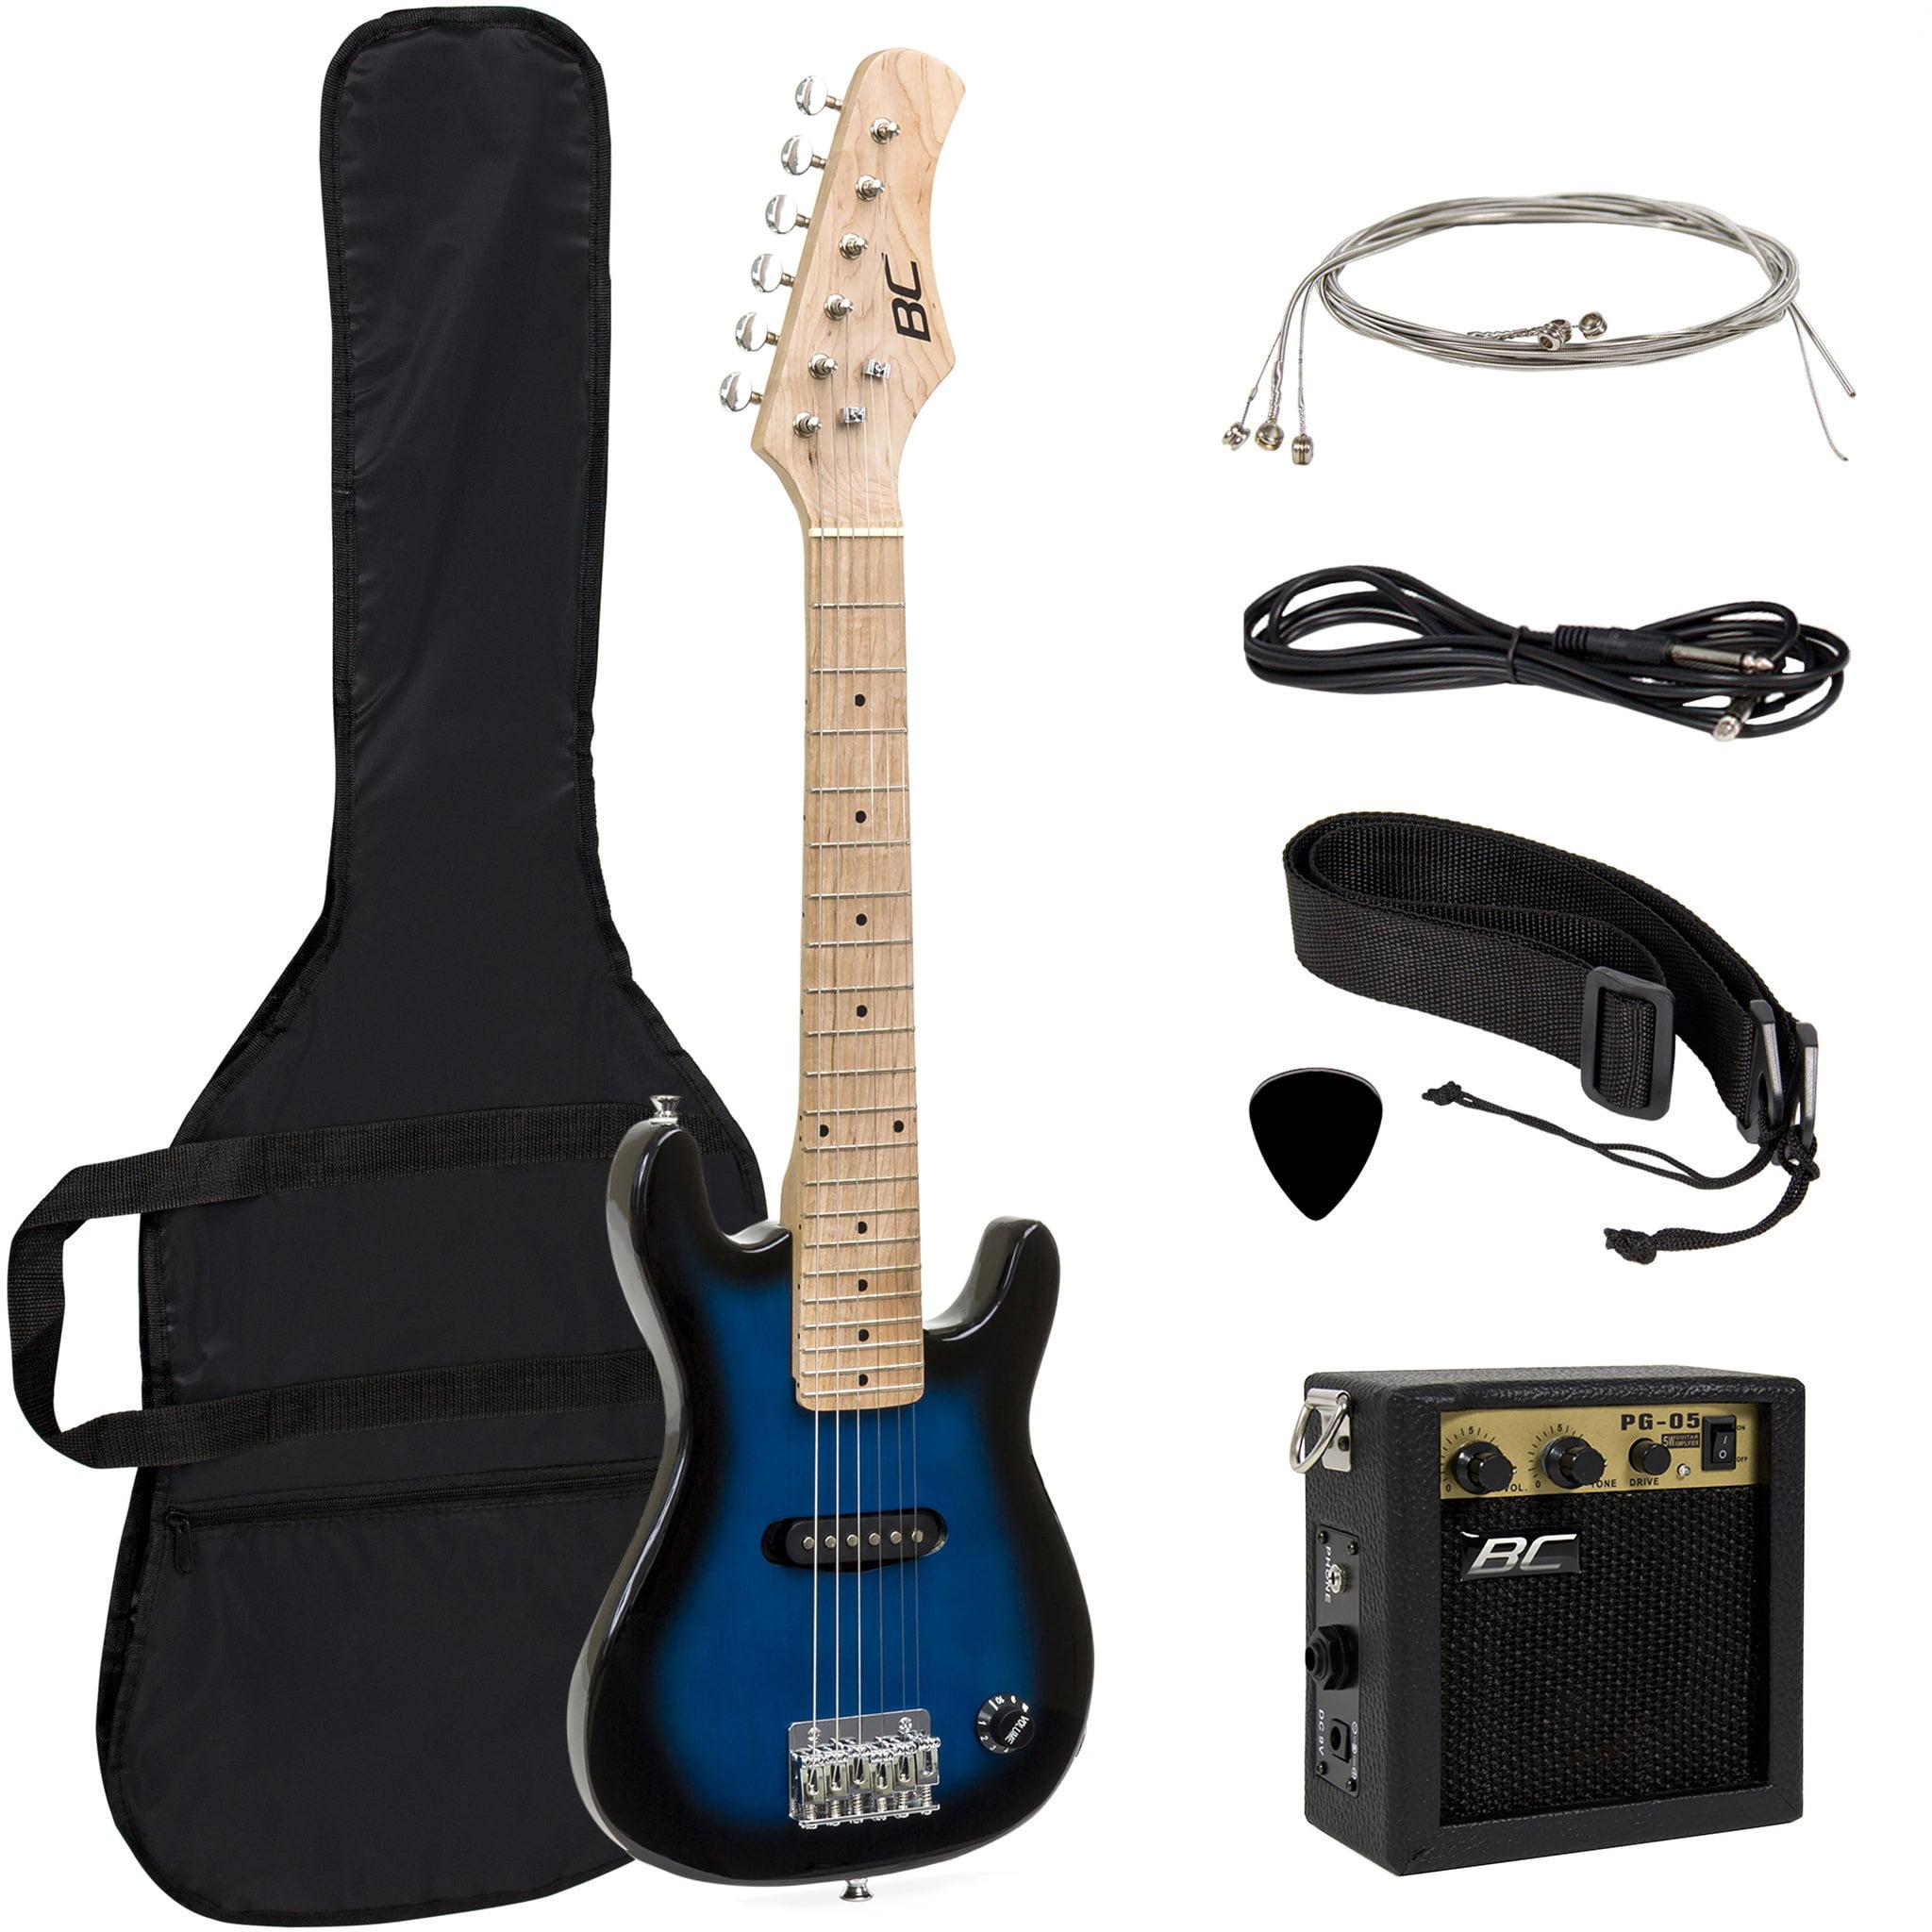 Best Choice Products 30in Kids 6-String Electric Guitar Beginner Starter Kit Bundle w/ 5W Amplifier, Strap, Case, Strings, Picks - Blue